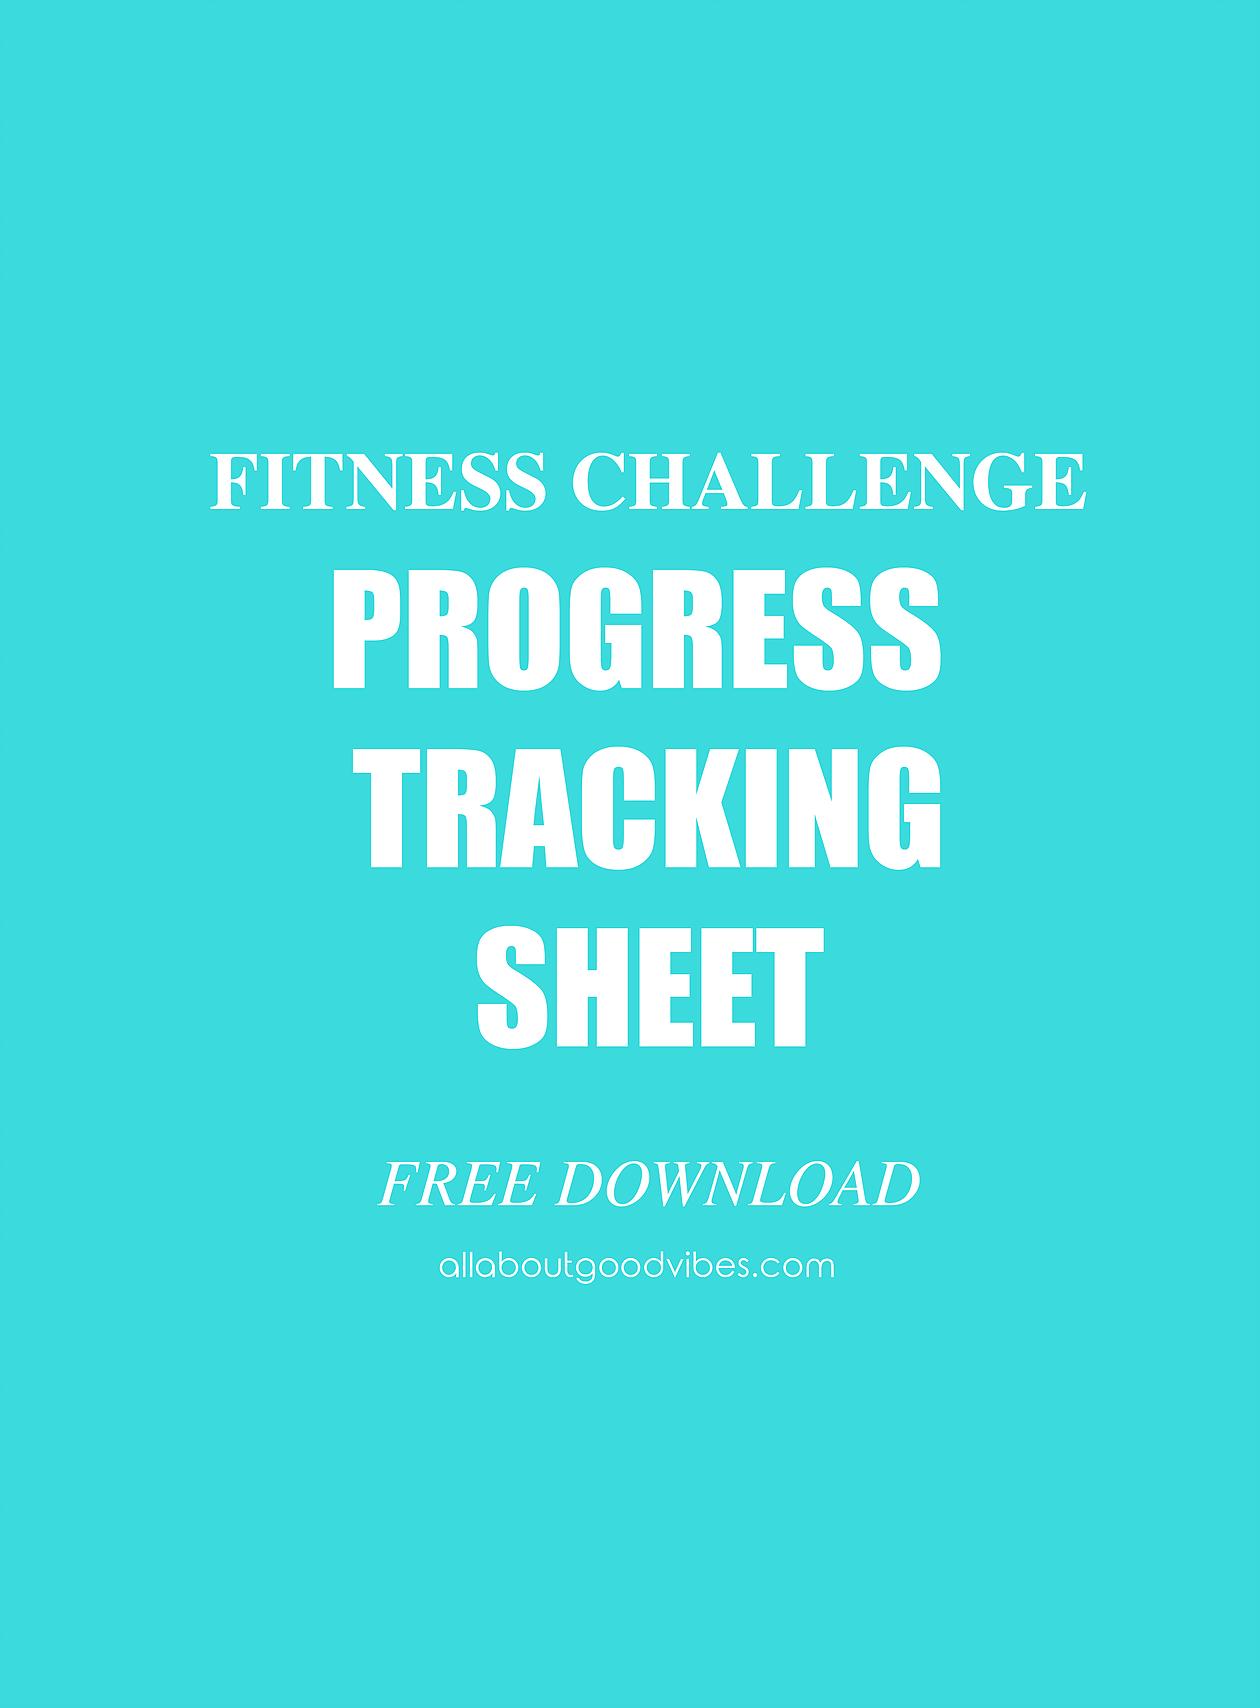 Fitness Progress Tracking Sheet-Free download